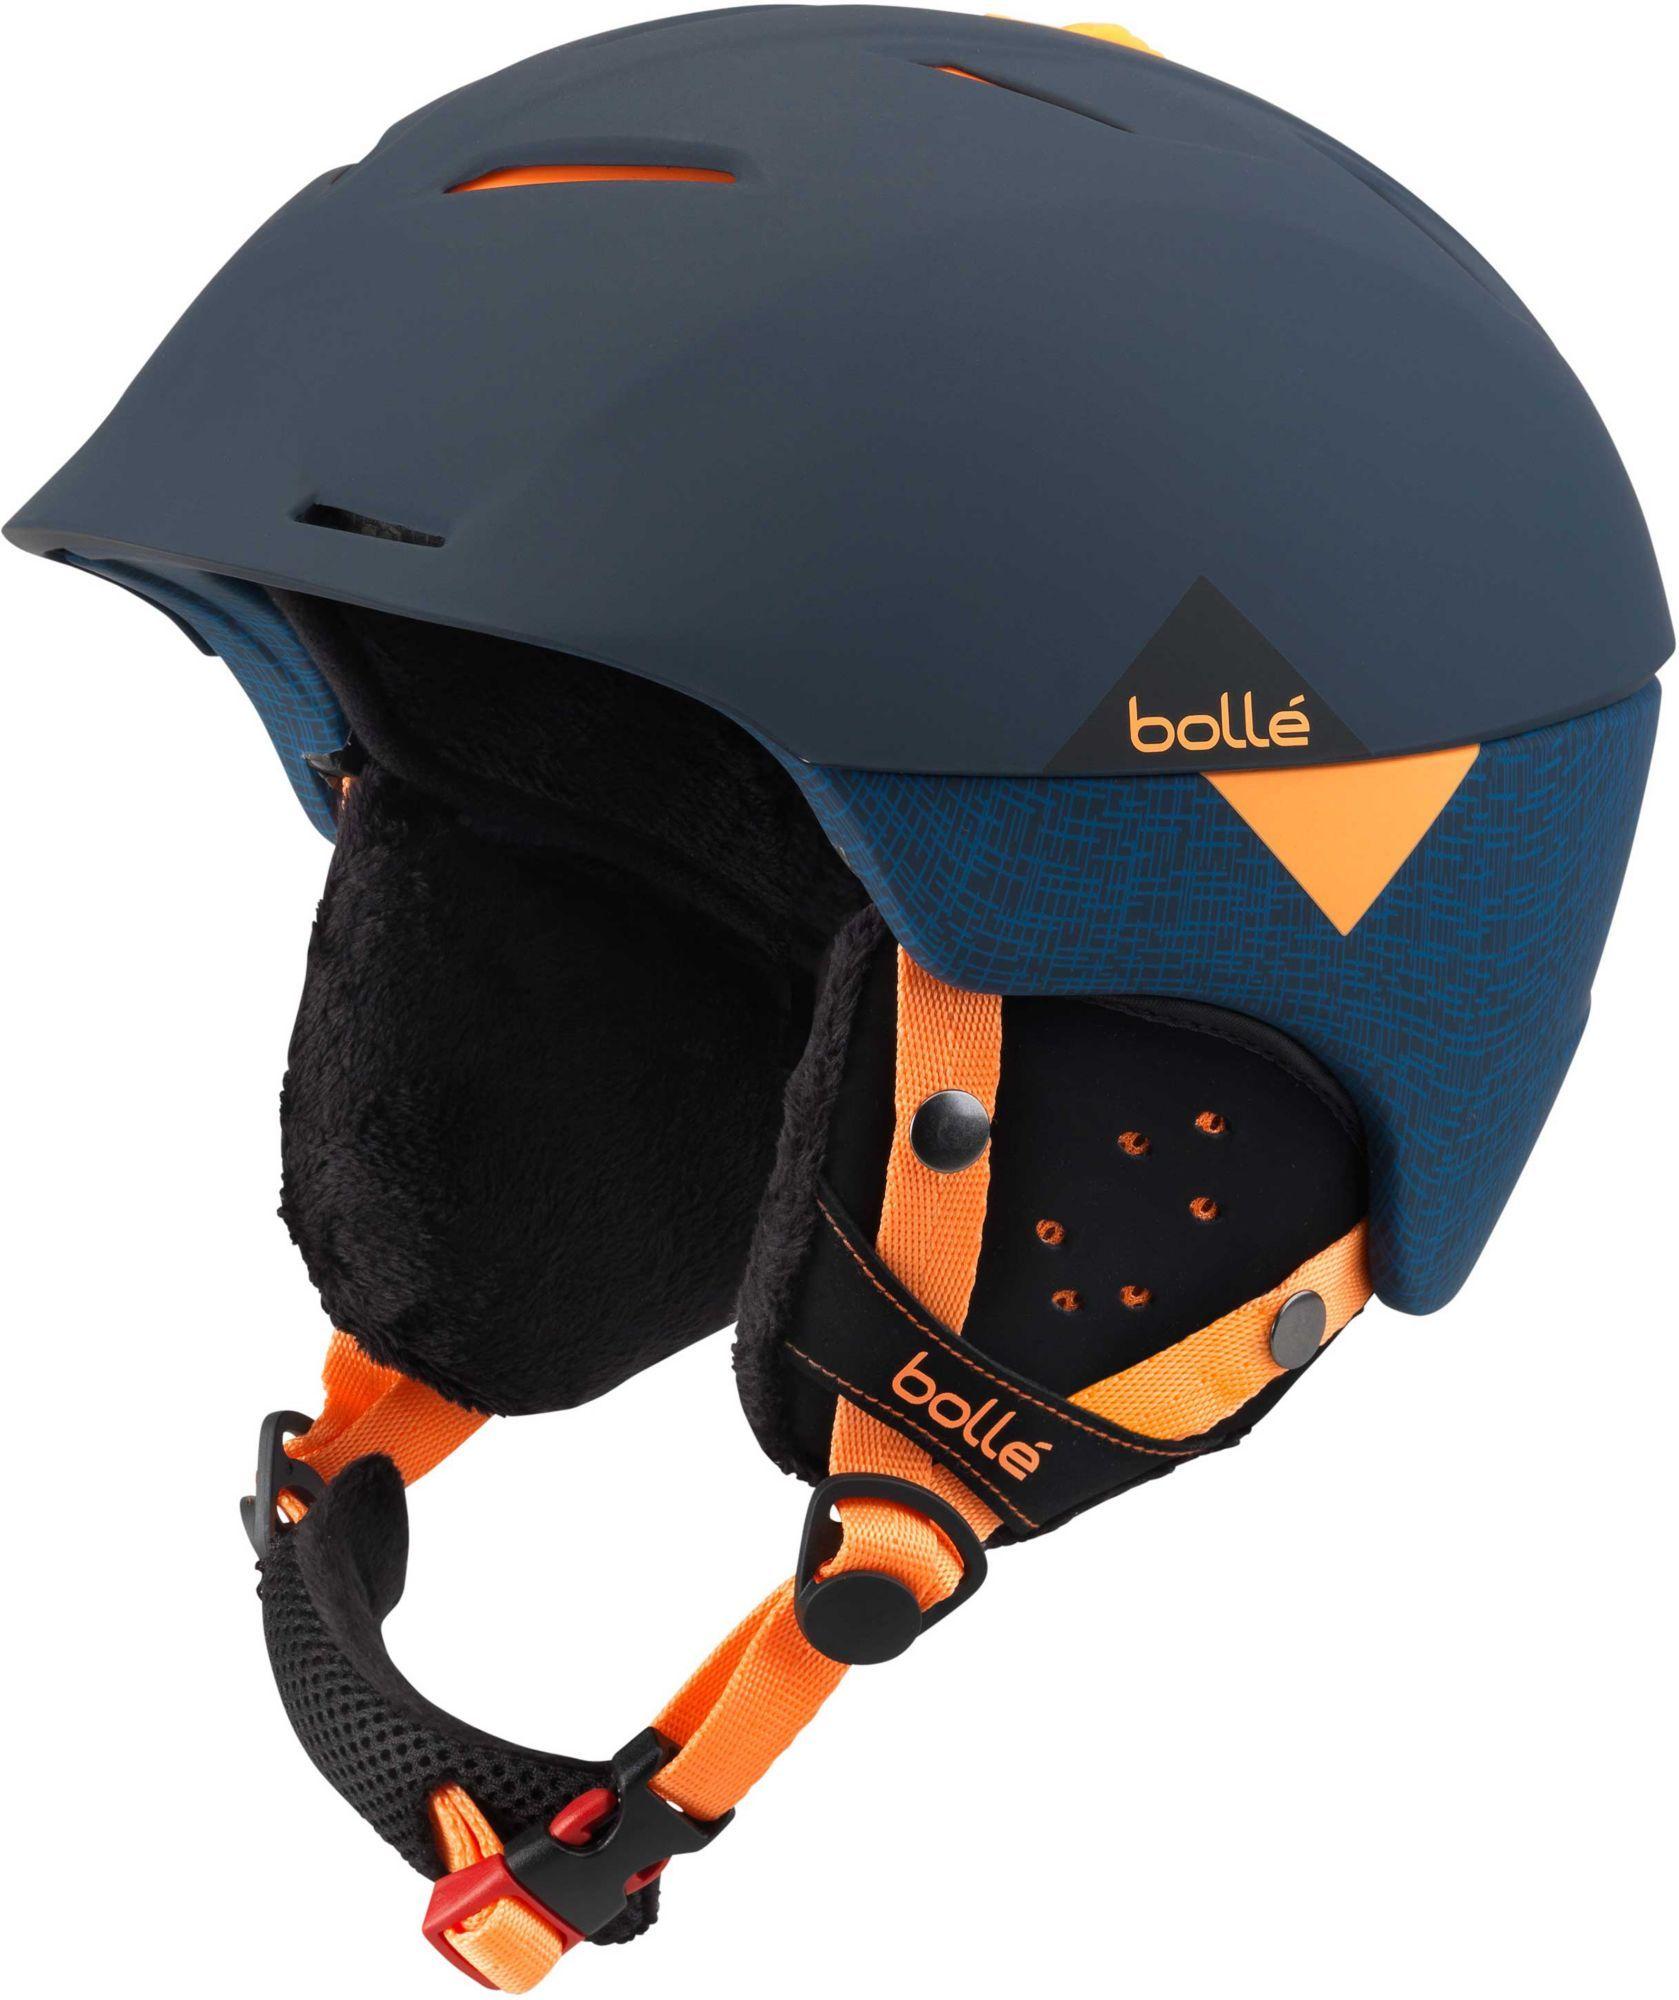 750f76b061ff Bolle Adult Synergy Snow Helmet in 2019